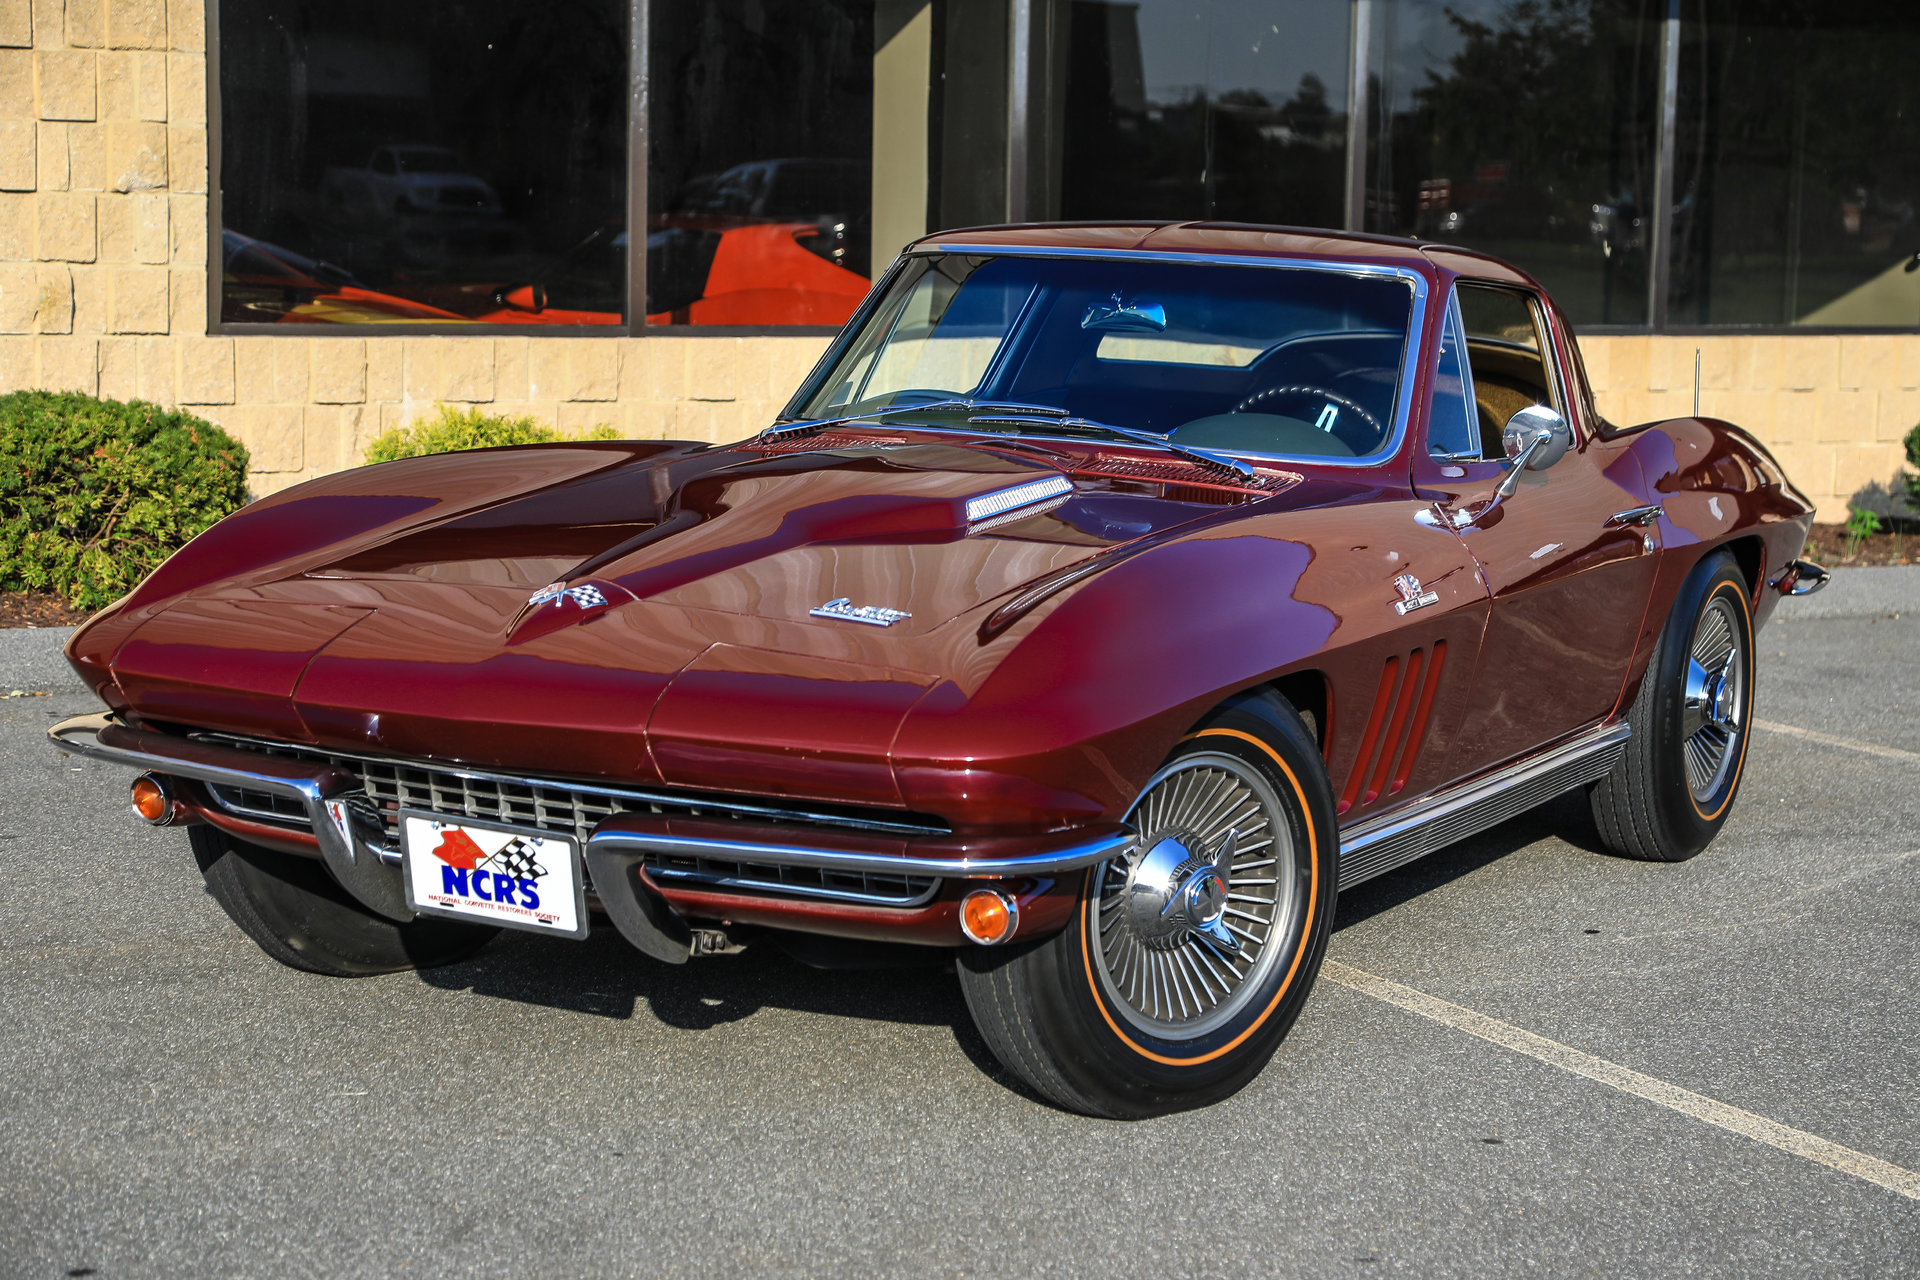 1966 Chevrolet Corvette BIG BLOCK 427 for sale #60911 | MCG